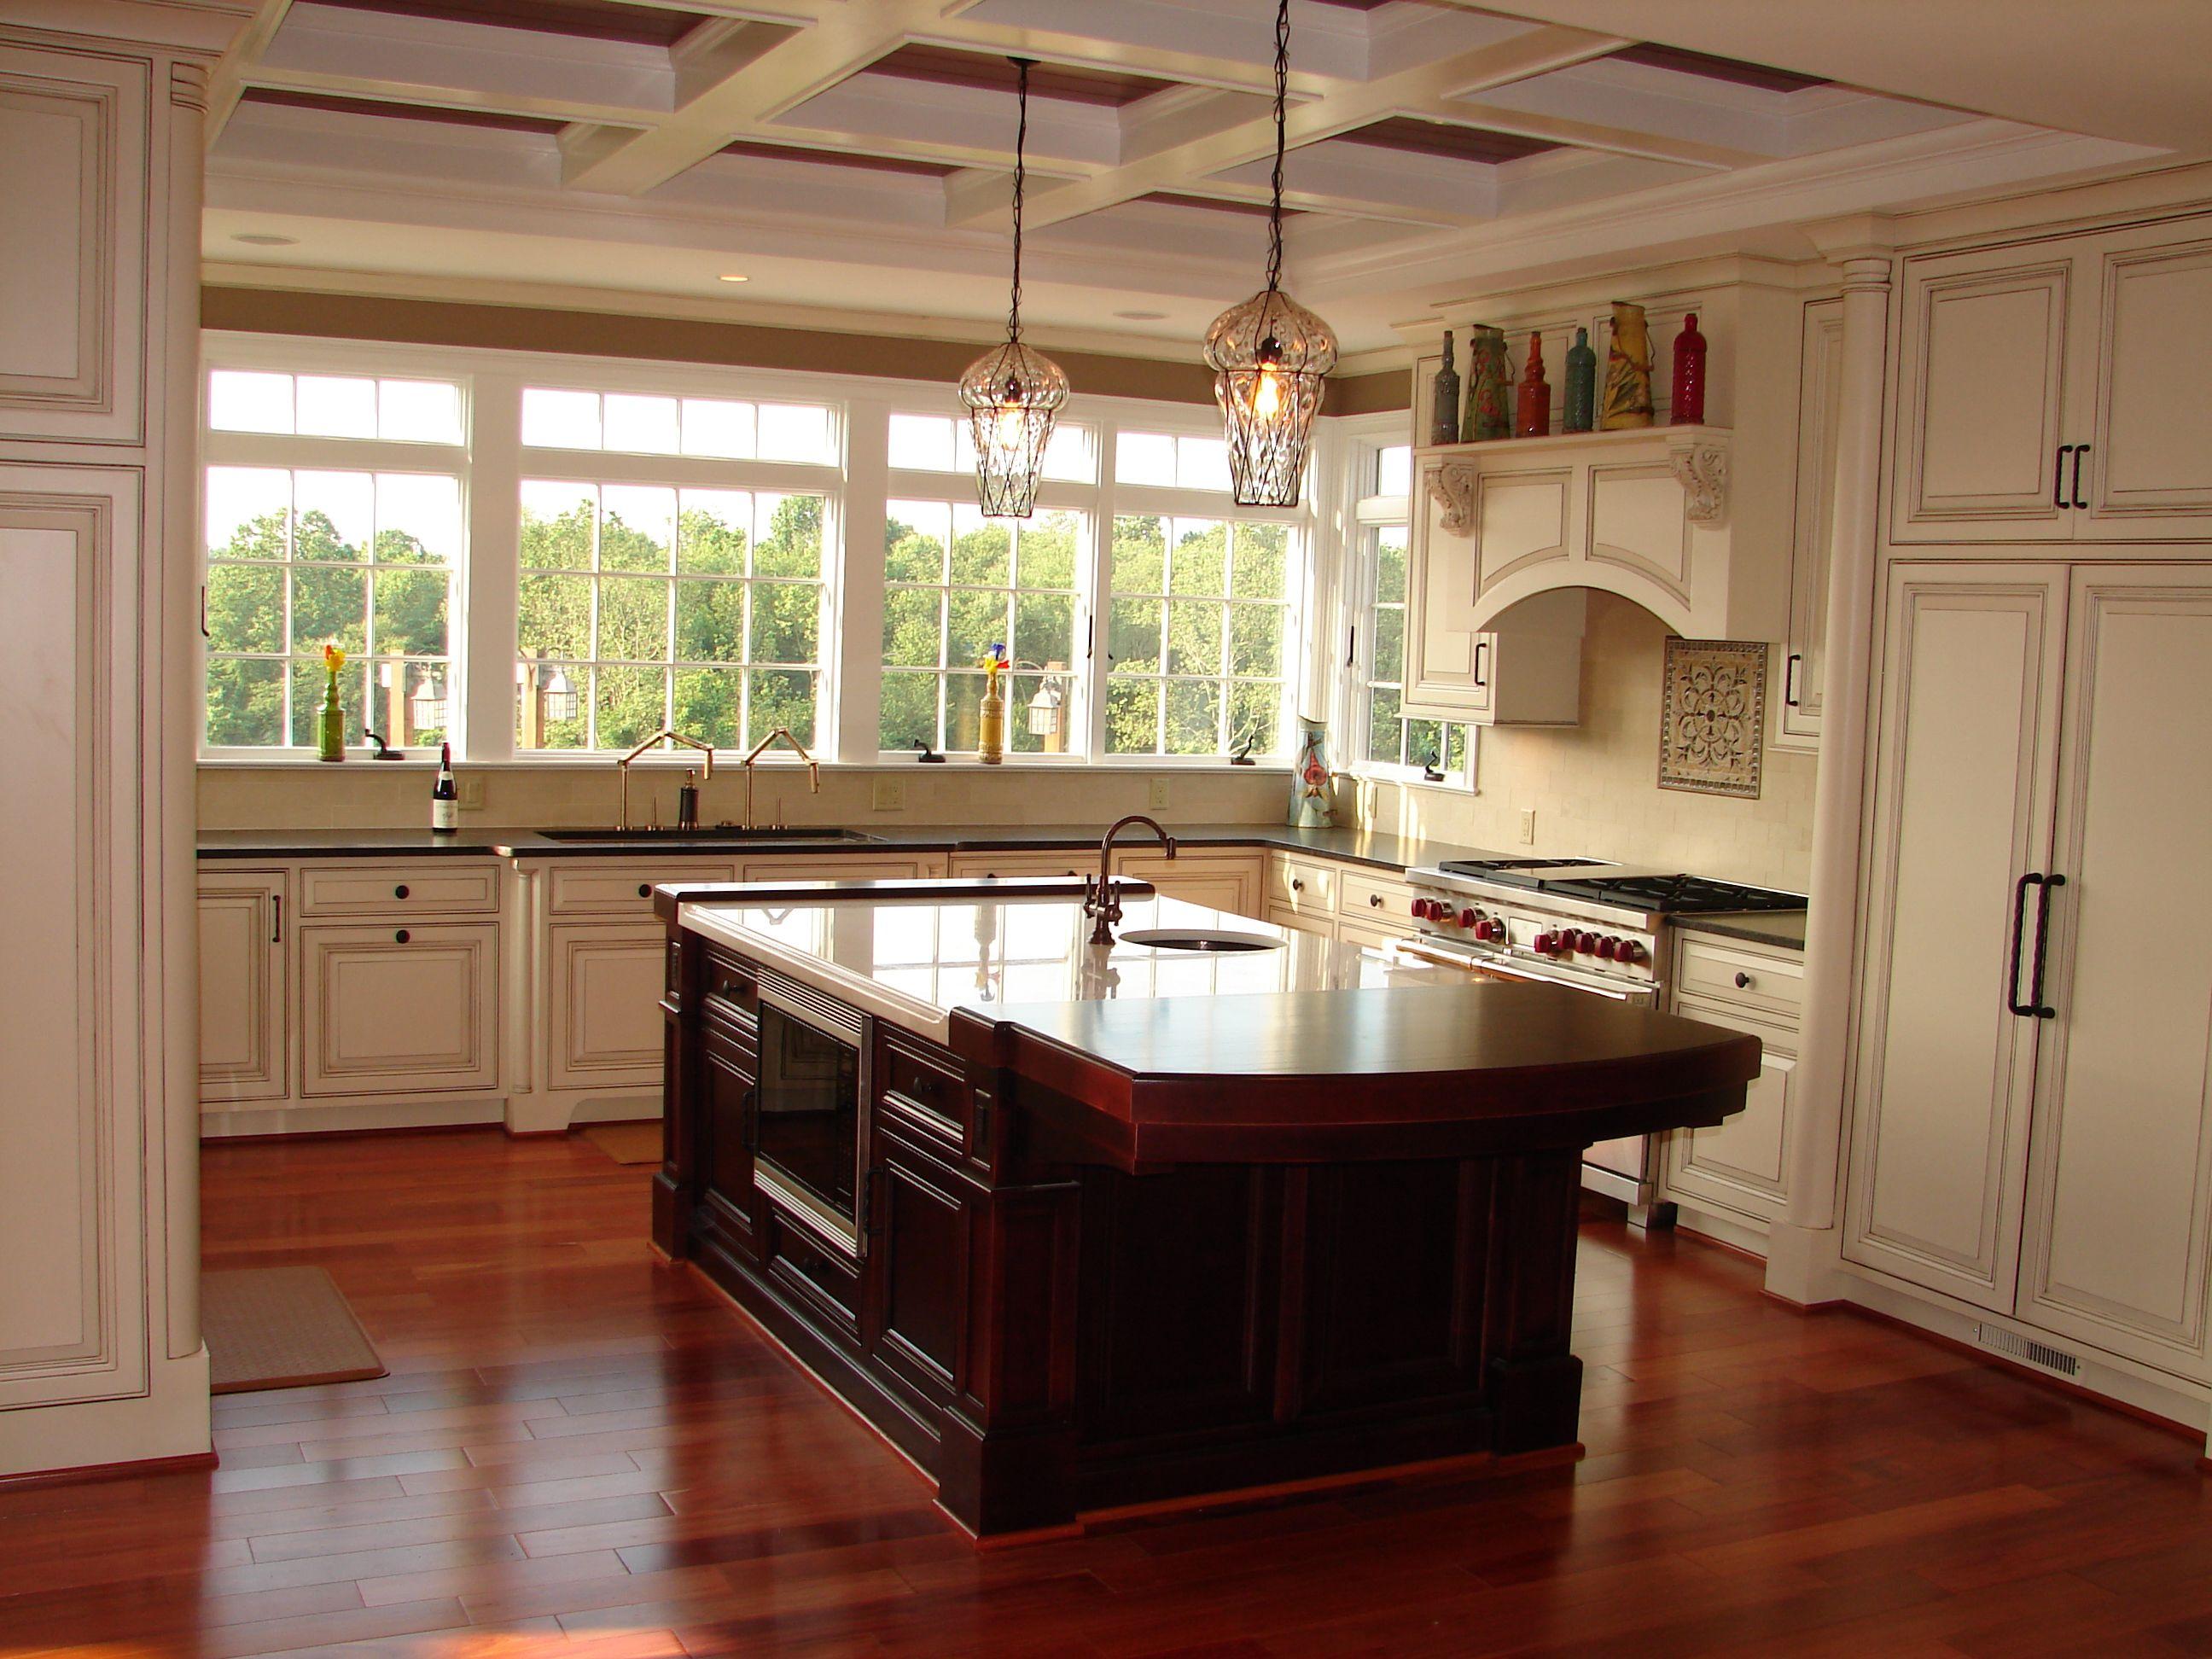 Kitchen remodel in n potomac md kitchen remodeling